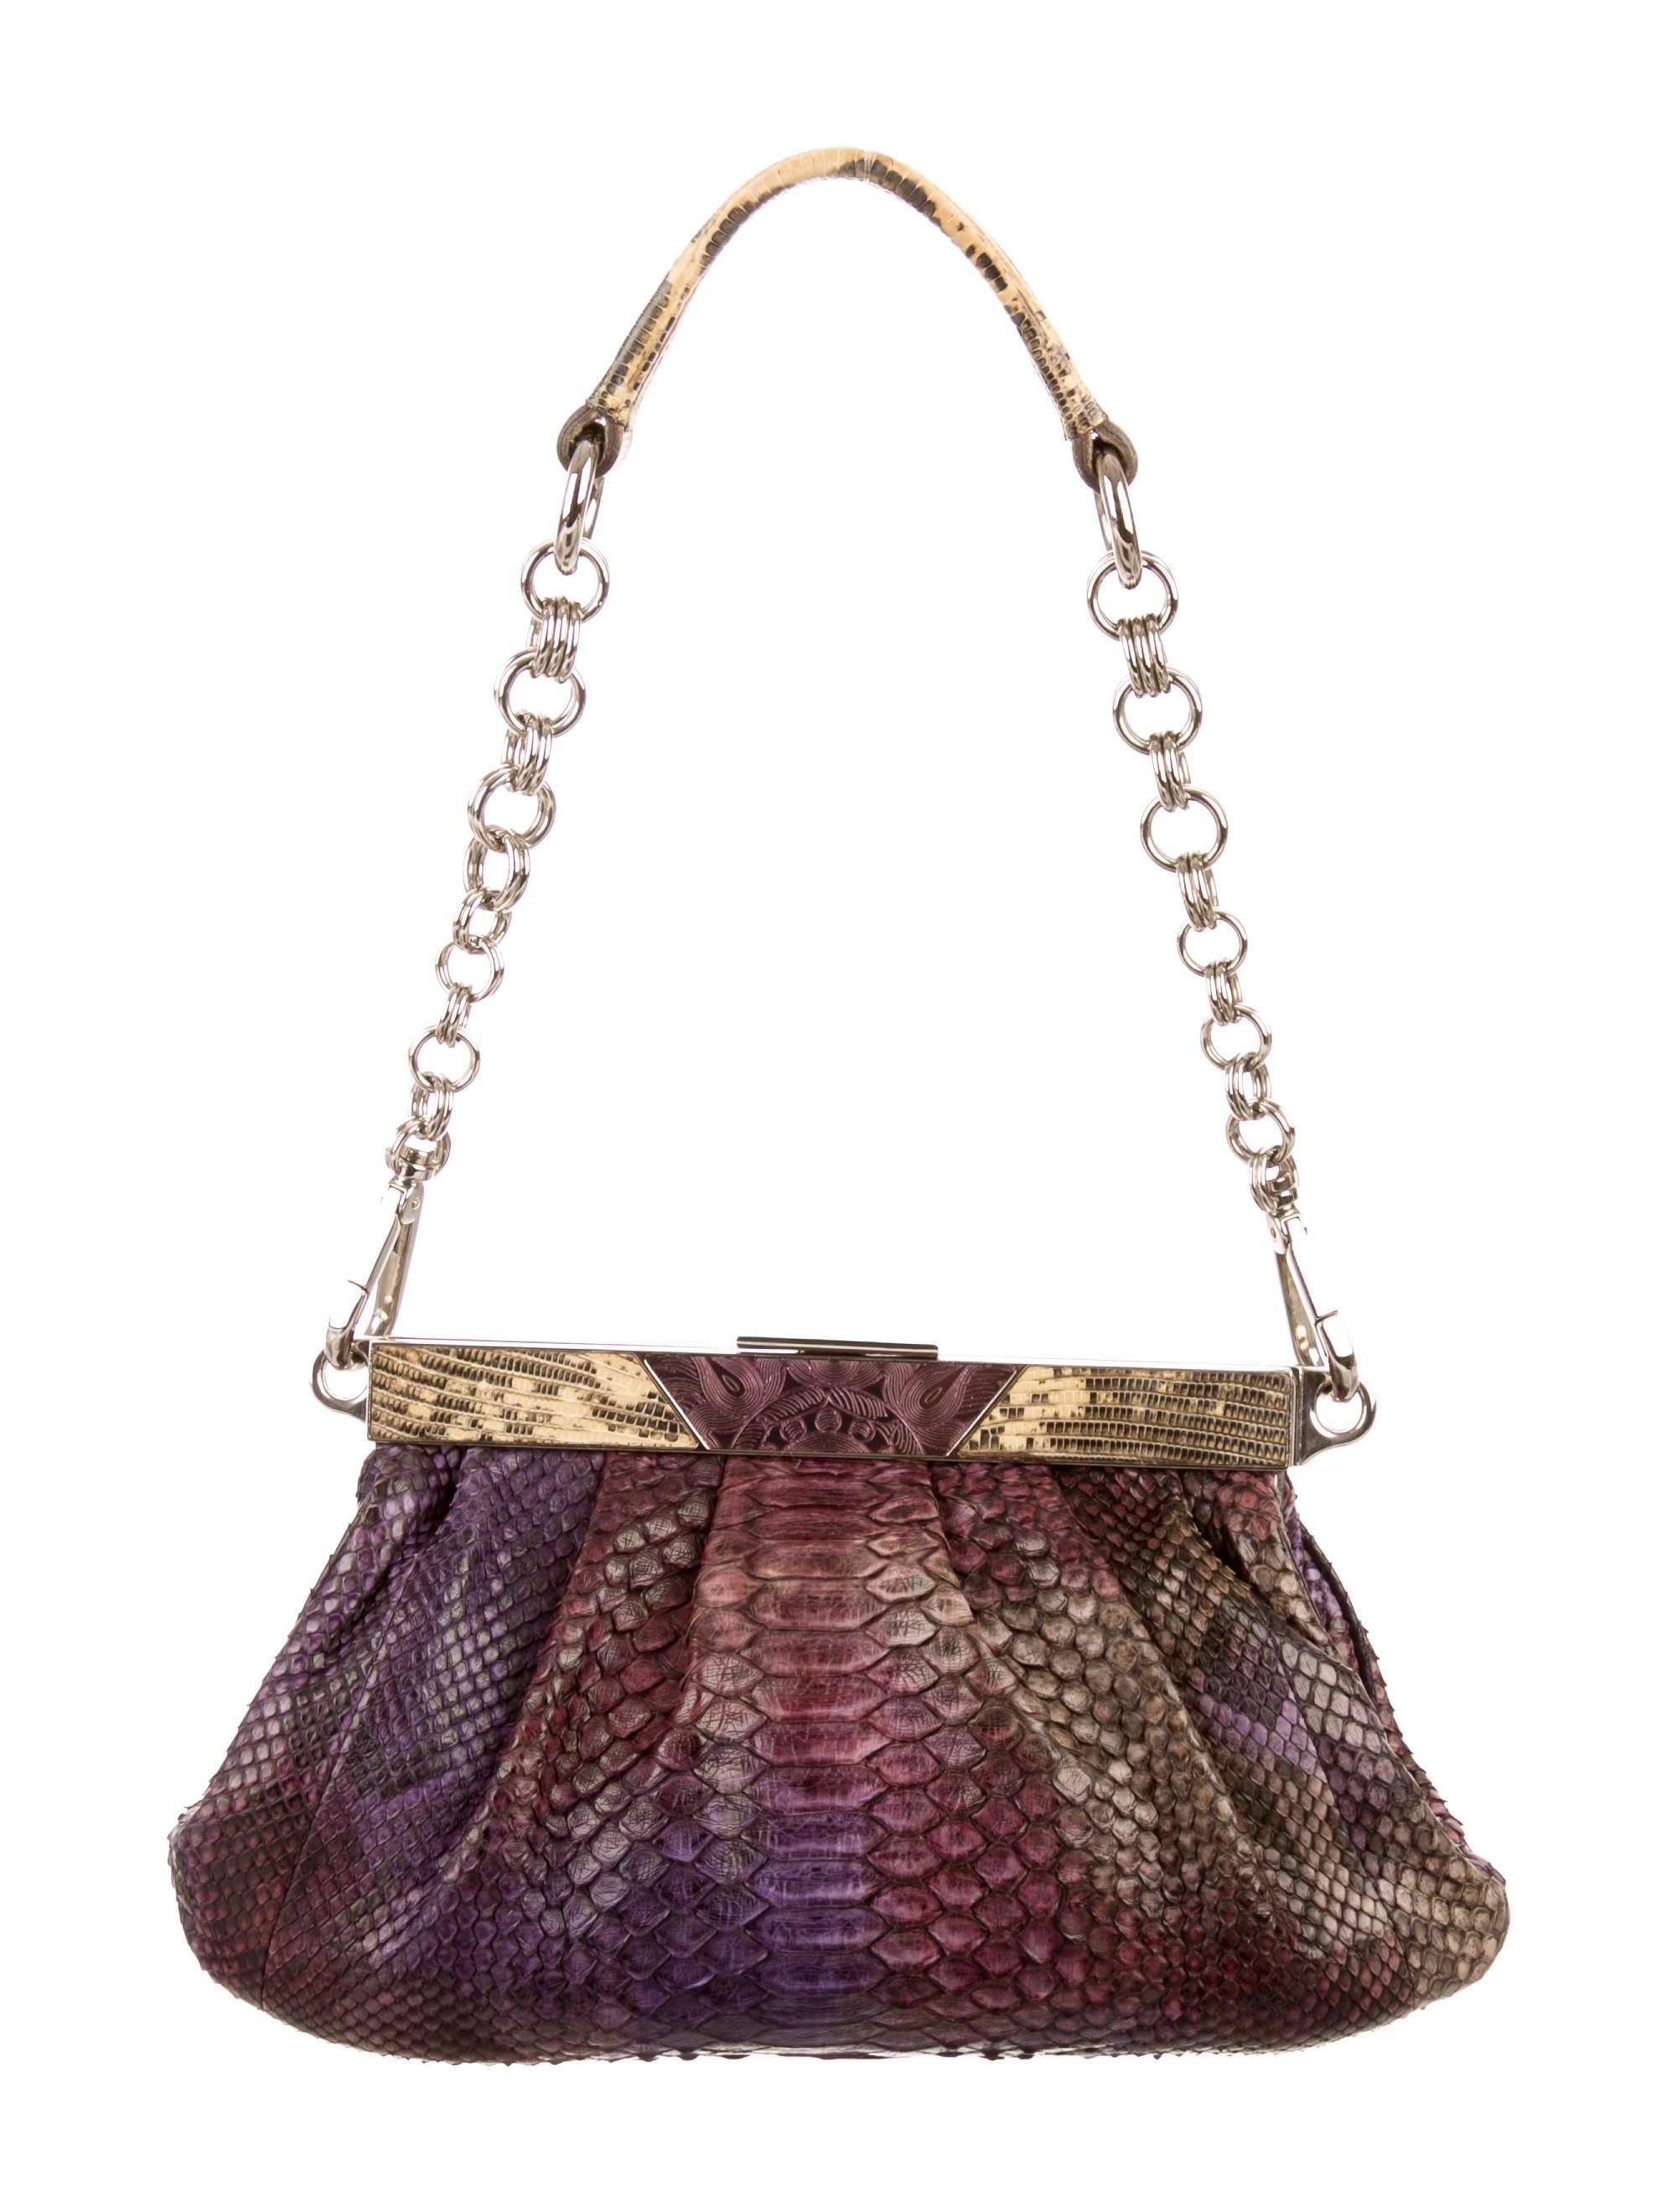 cc891cd6d02f22 Prada Python & Lizard Pochette - Handbags - PRA103053 | The RealReal